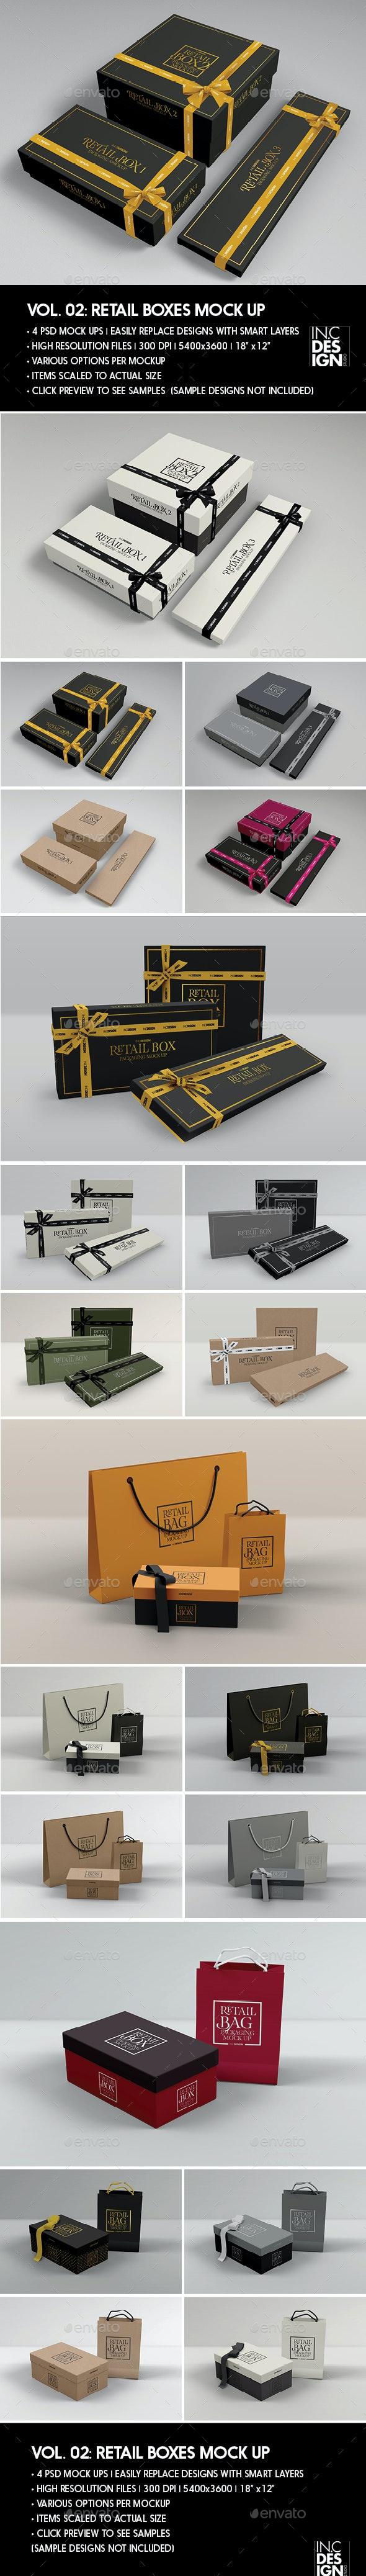 Retail Boxes Vol.2: Bag & Box Packaging Mock Ups - Packaging Product Mock-Ups